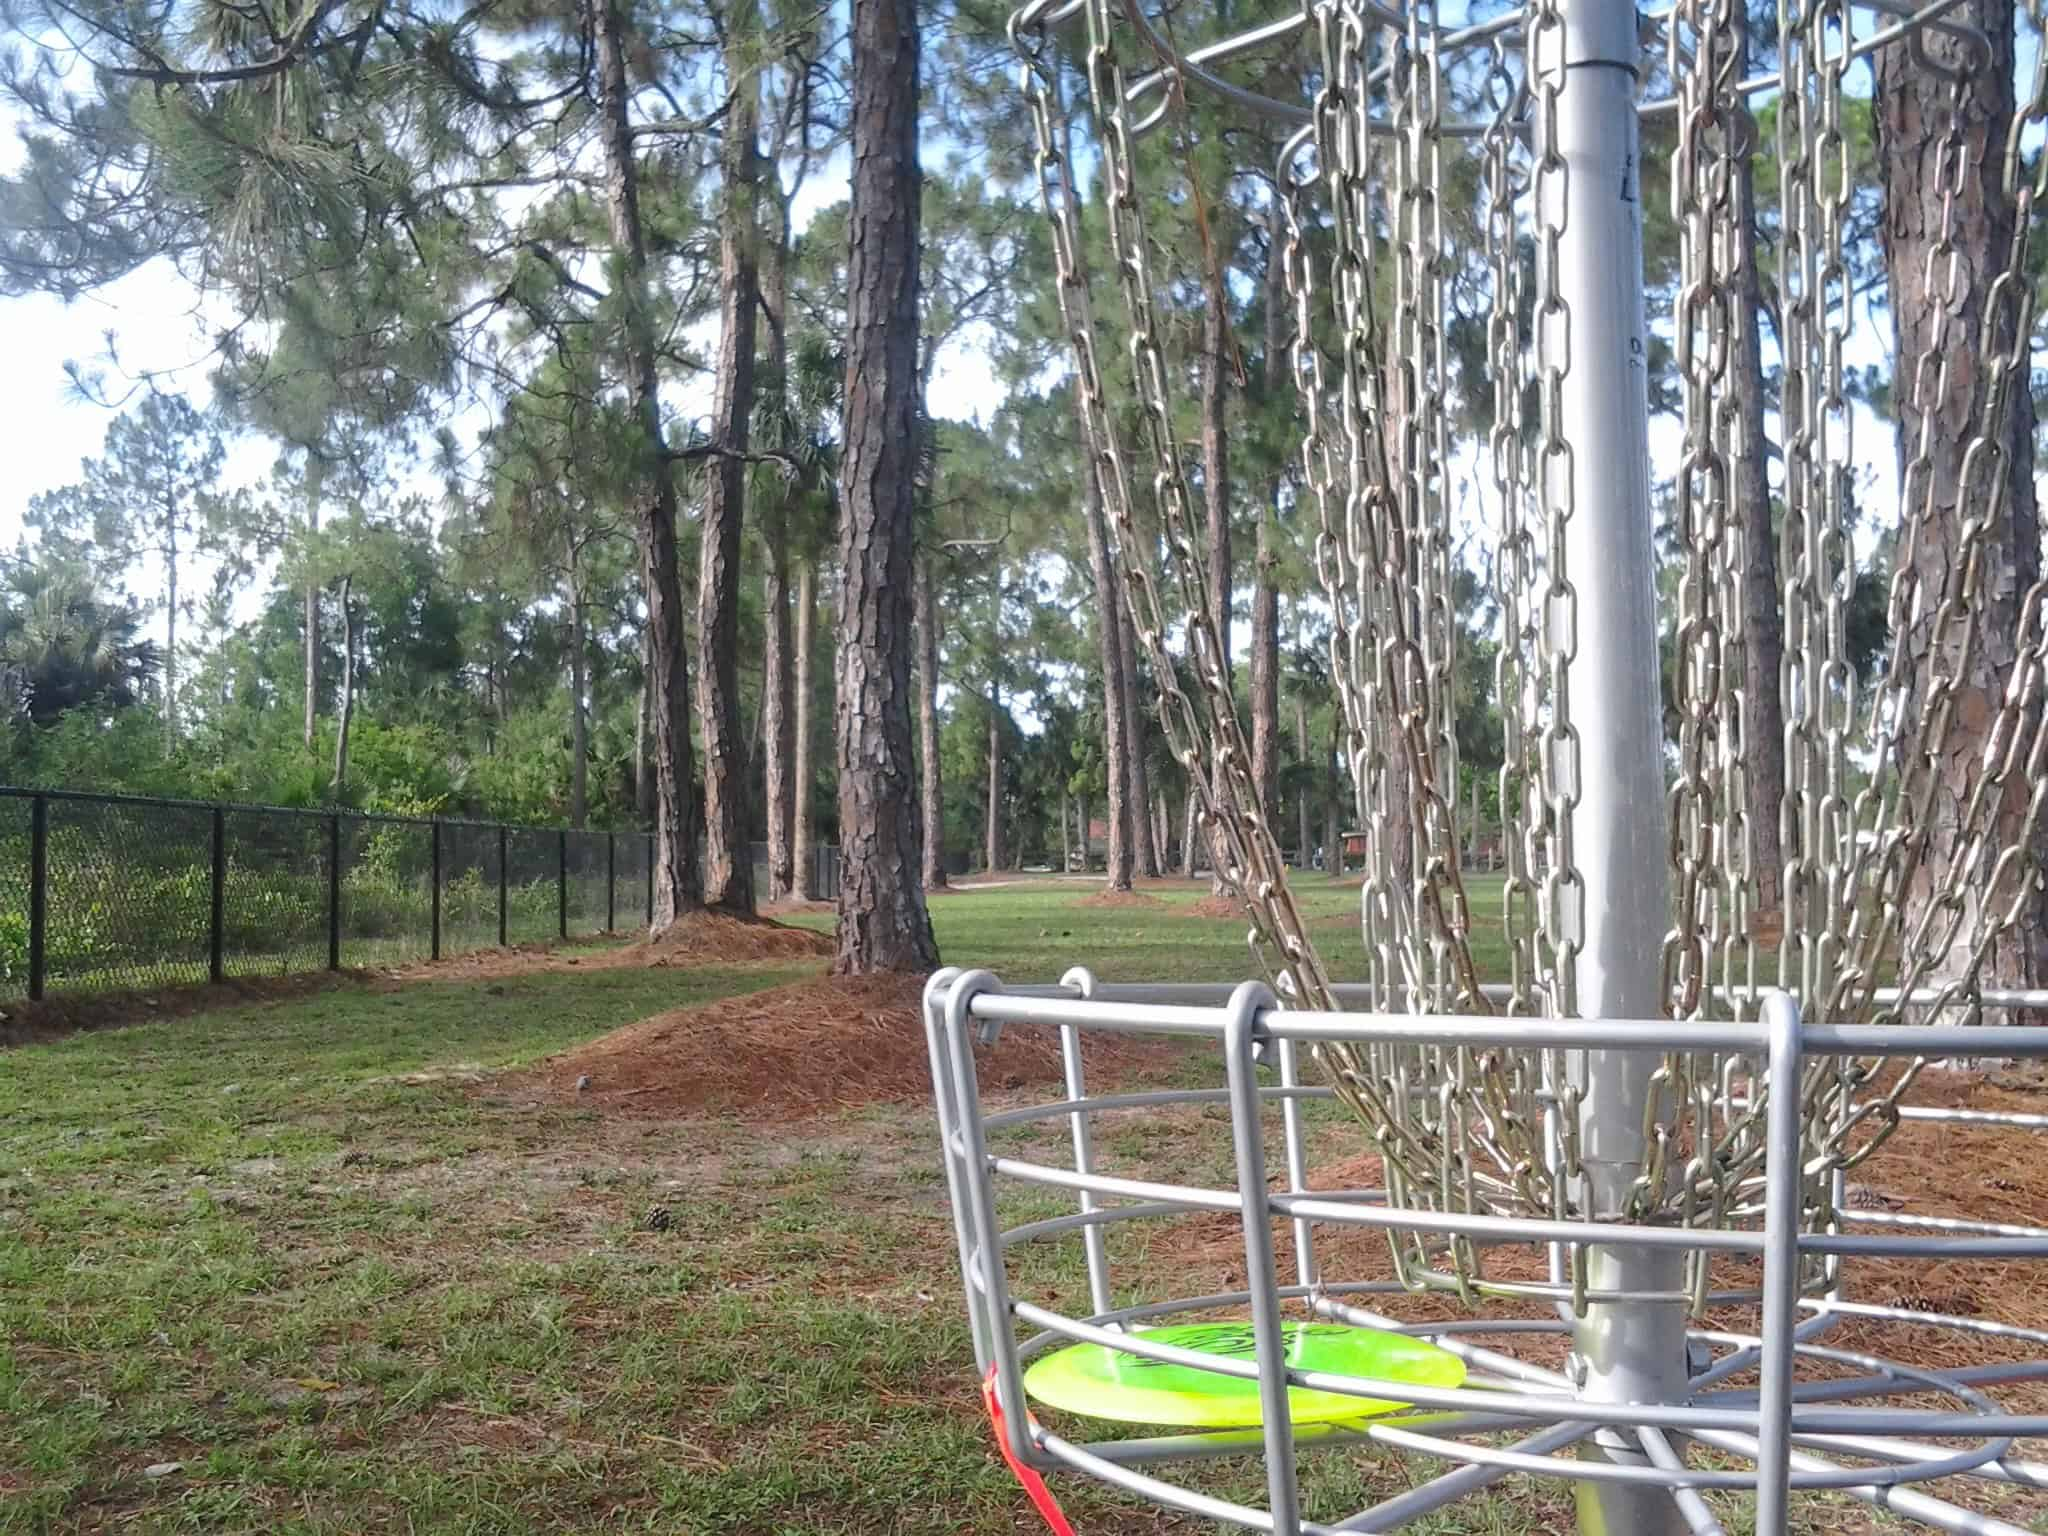 Frisbee golf disc in basket